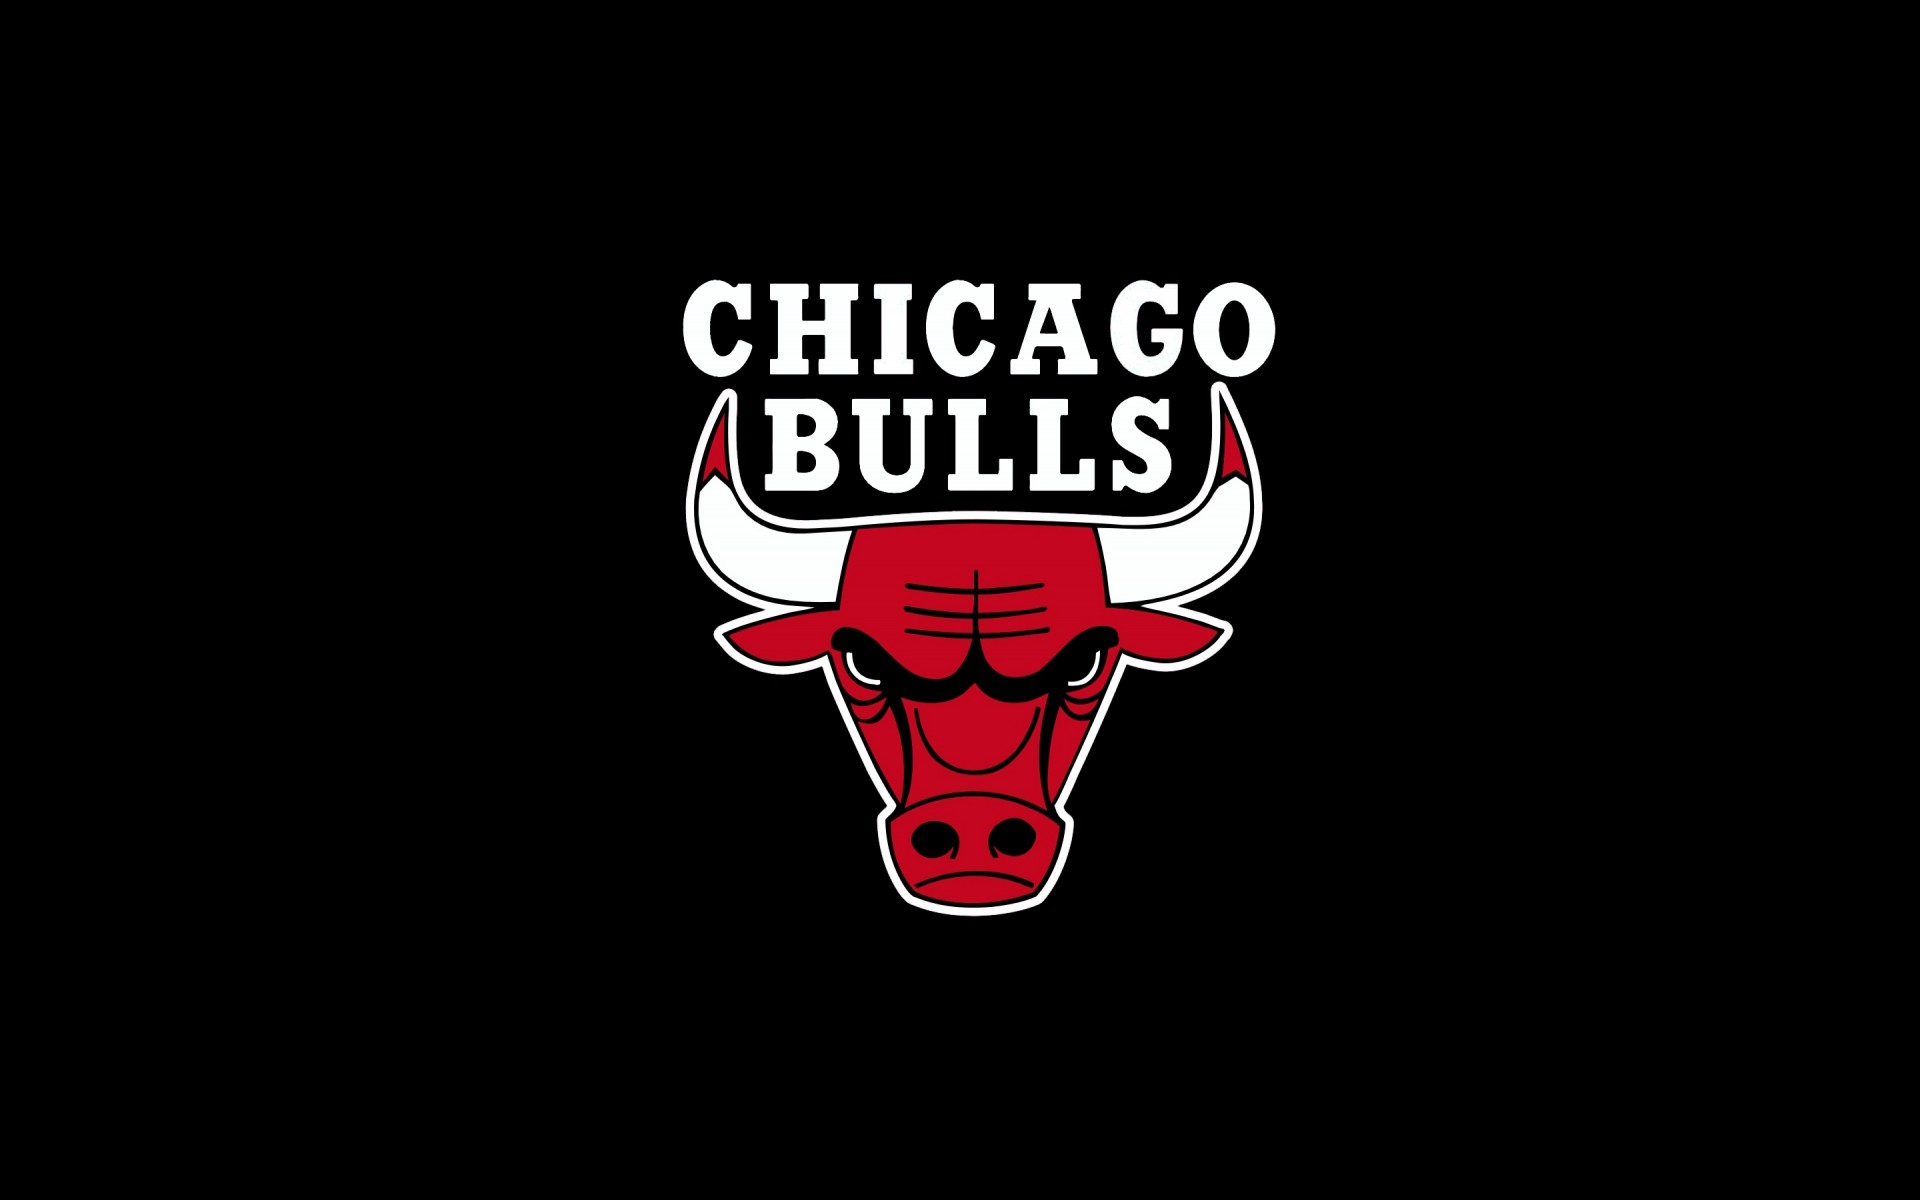 High Resolution Wallpaper | Chicago Bulls 1920x1200 px